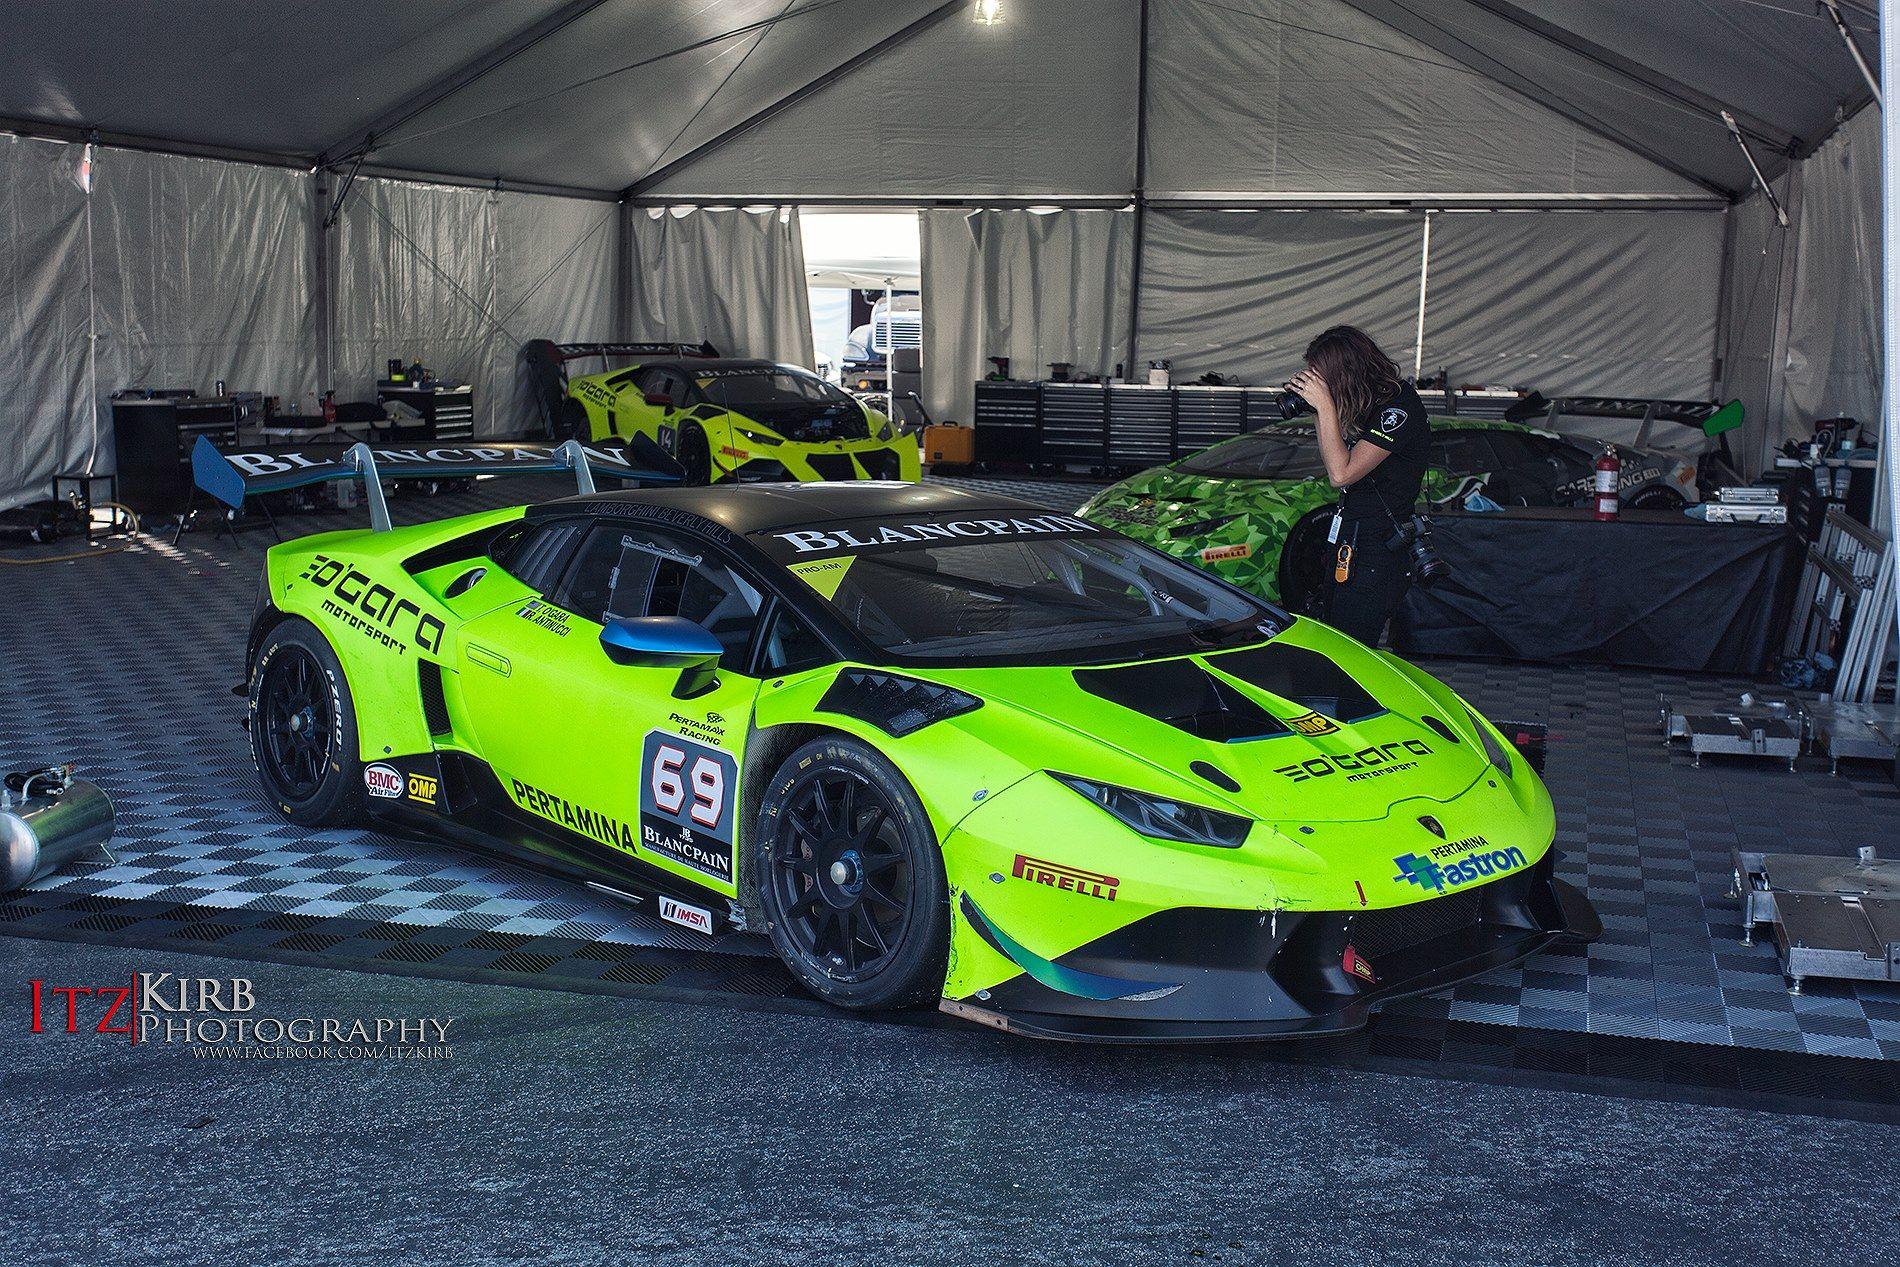 e5c2a6c5839ed005d21aae9f02fe809e Gorgeous Lamborghini Huracan Lp620-2 Super Trofeo top Speed Cars Trend